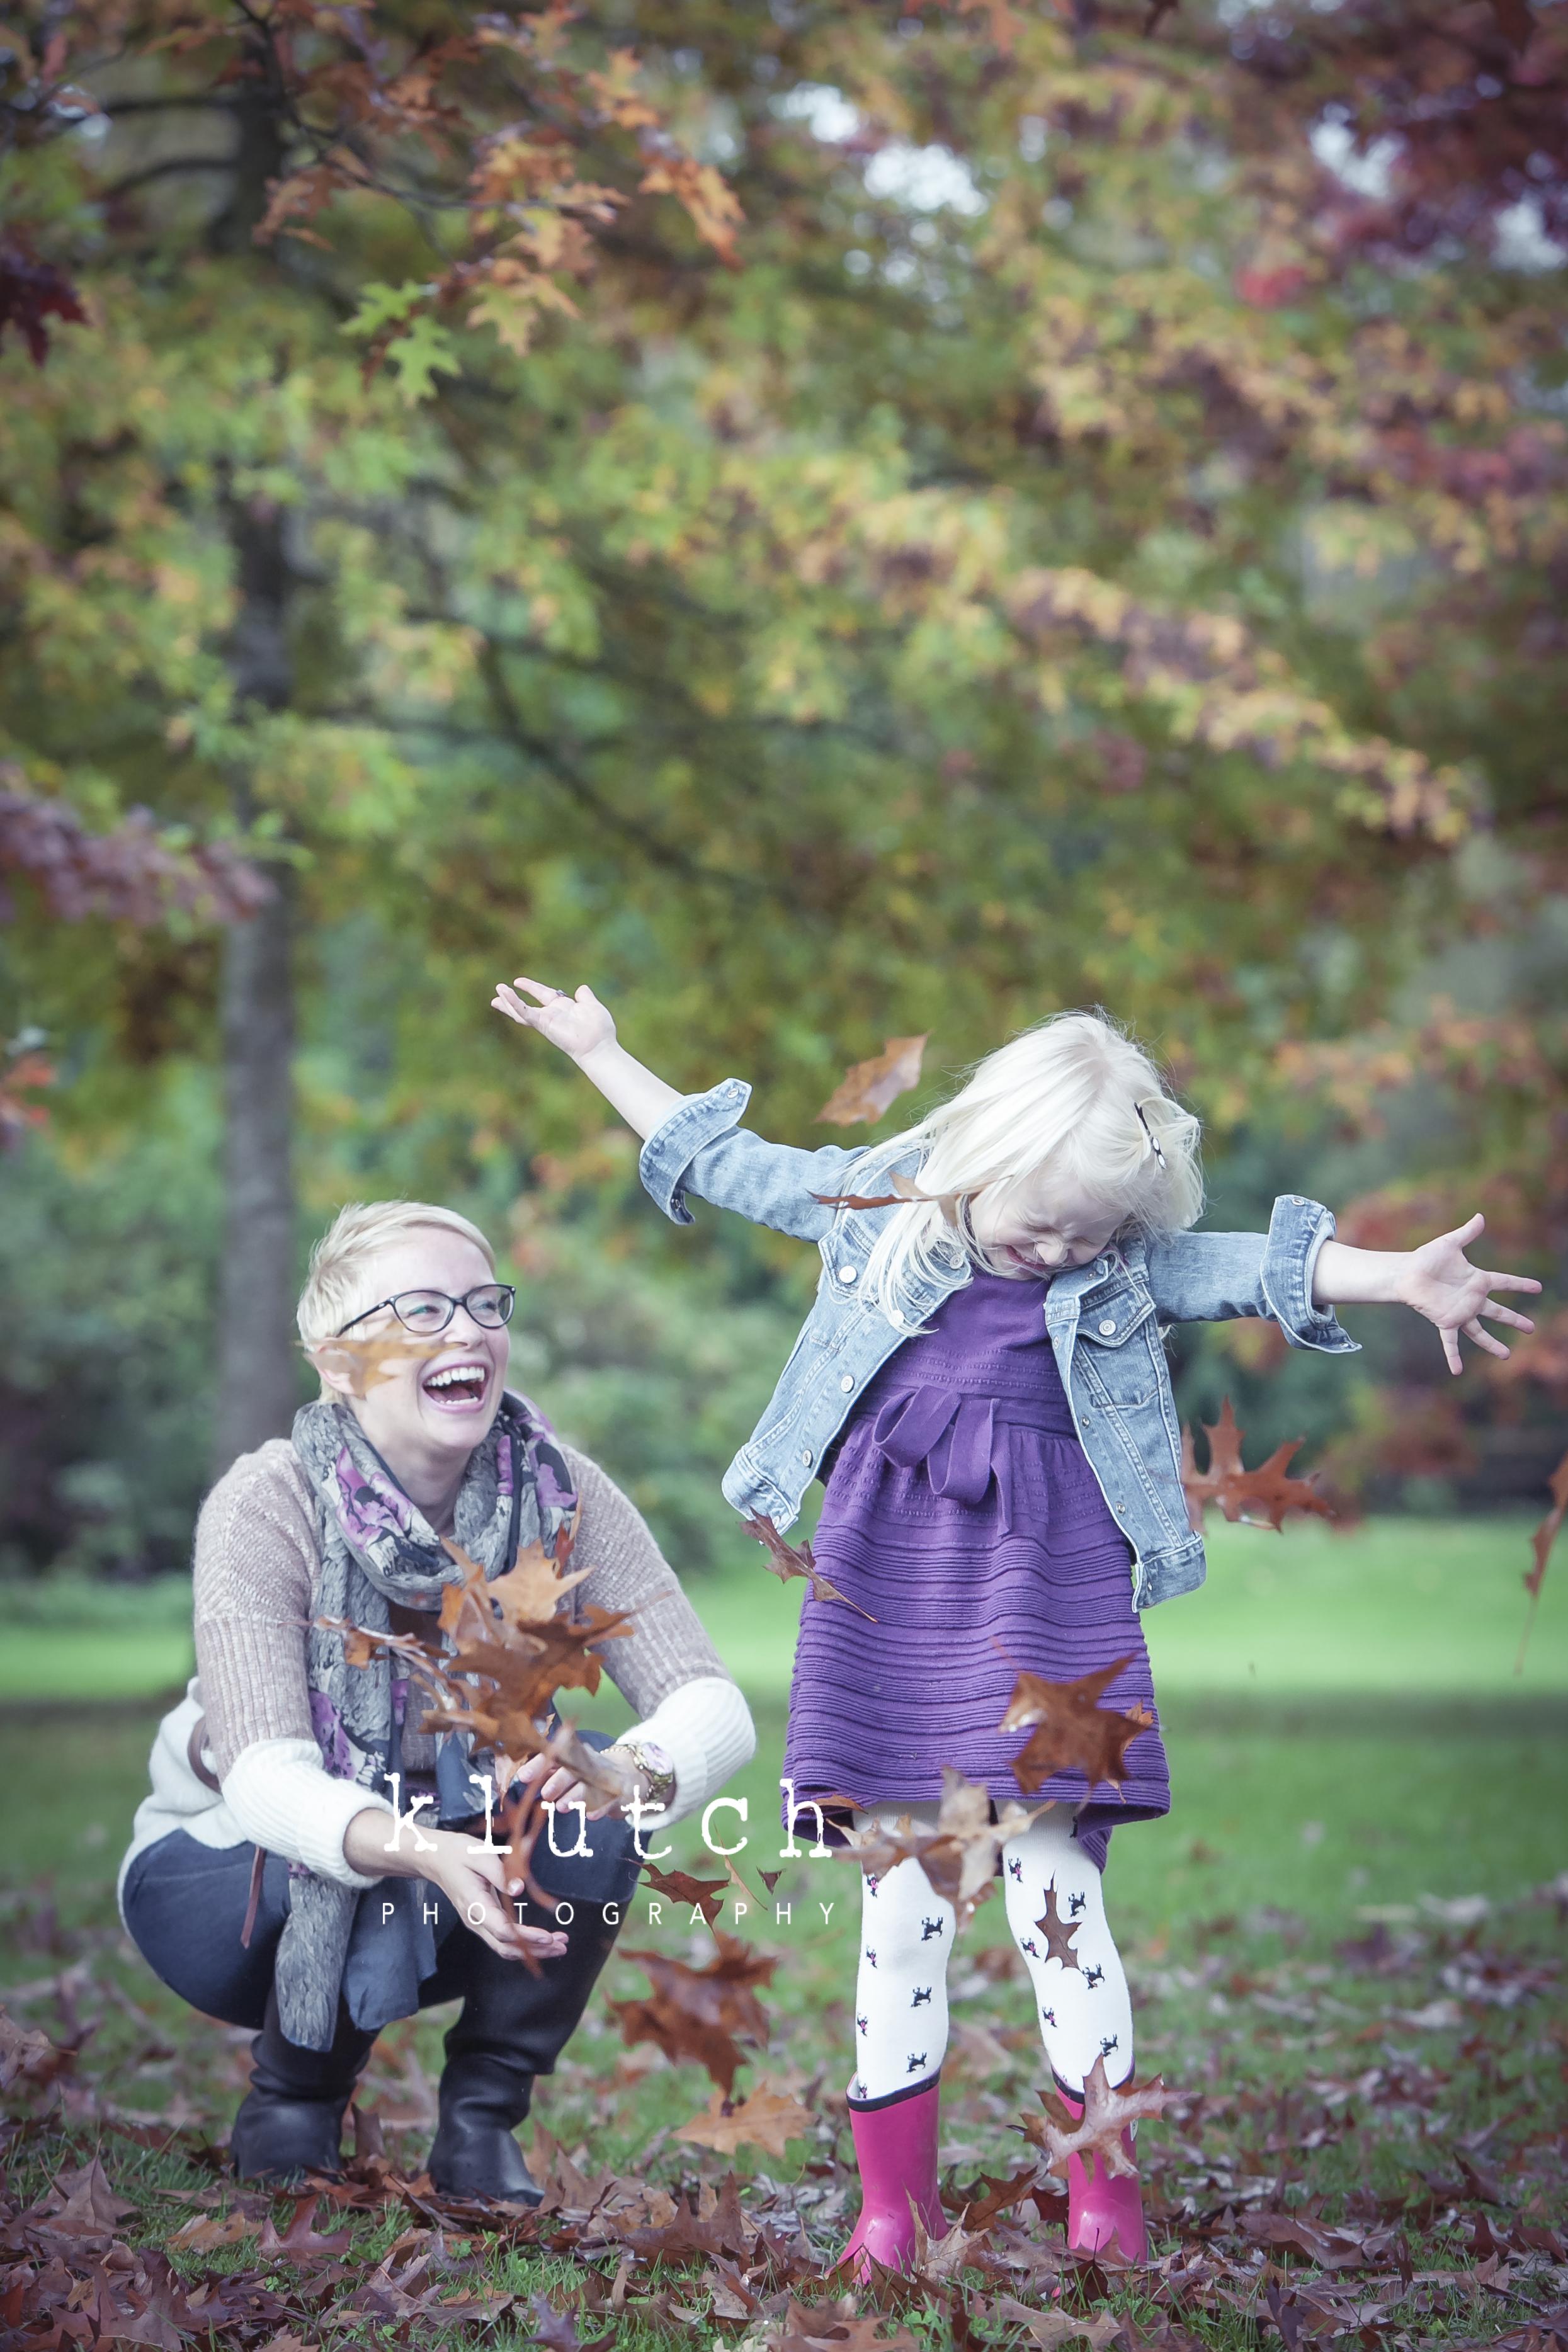 Klutch Photography,white rock family photographer, vancouver family photographer, whiterock lifestyle photographer, life unscripted photographer, life unscripted session, photography,Dina Ferreira Stoddard-8737.jpg